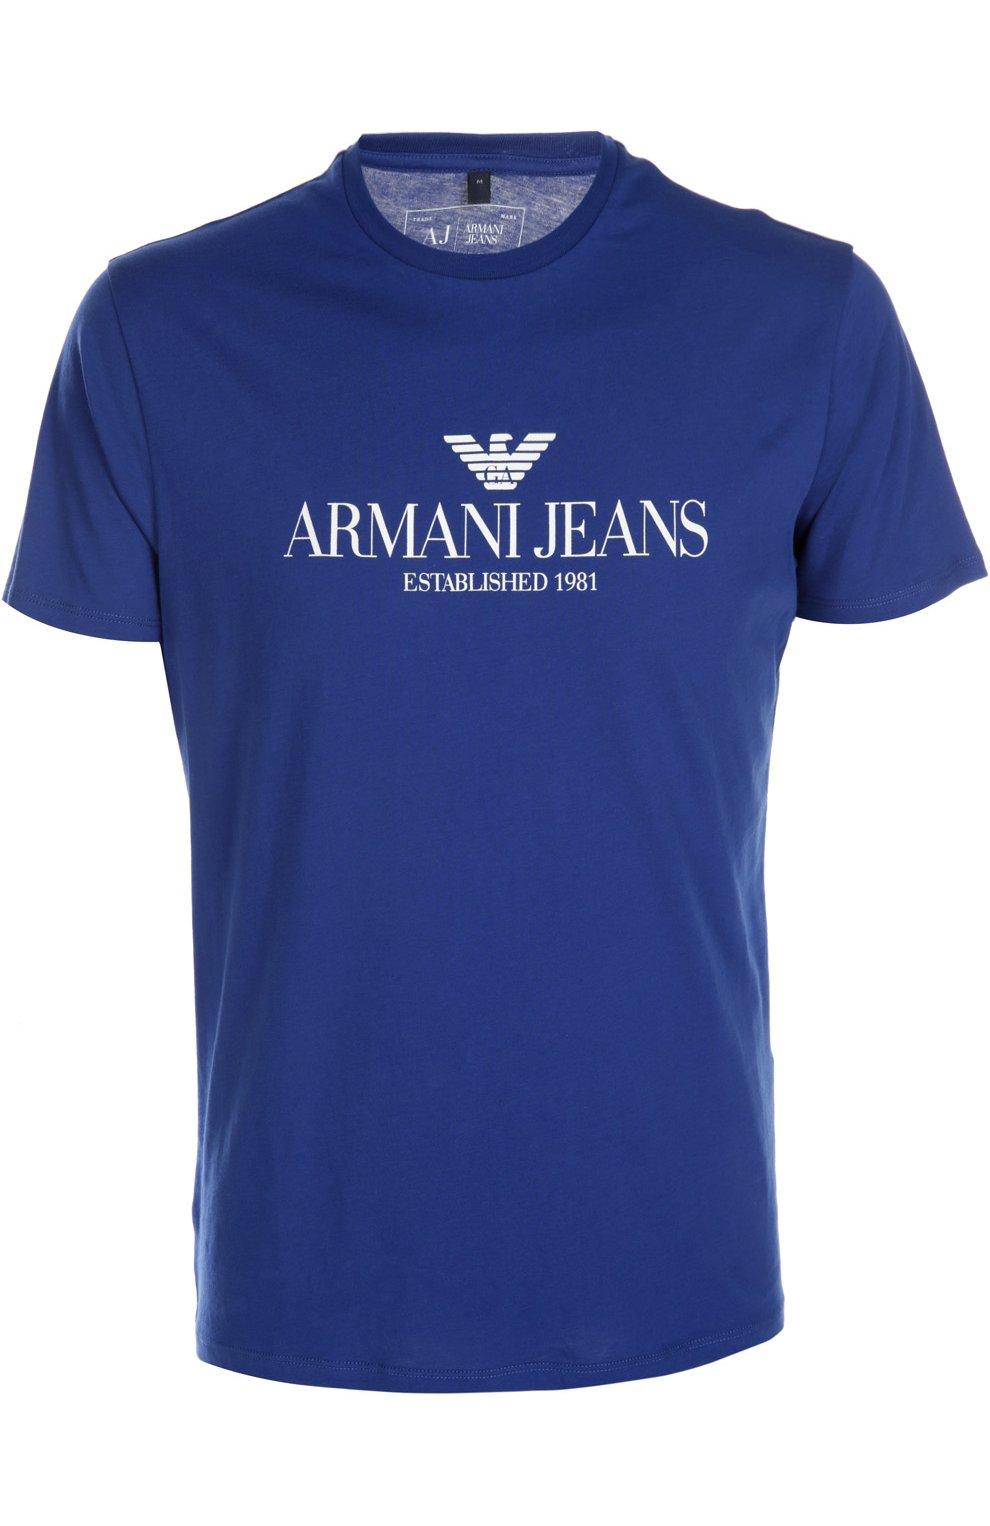 b2fb45539d201 Мужская синяя футболка джерси ARMANI JEANS — купить за 4995 руб. в ...